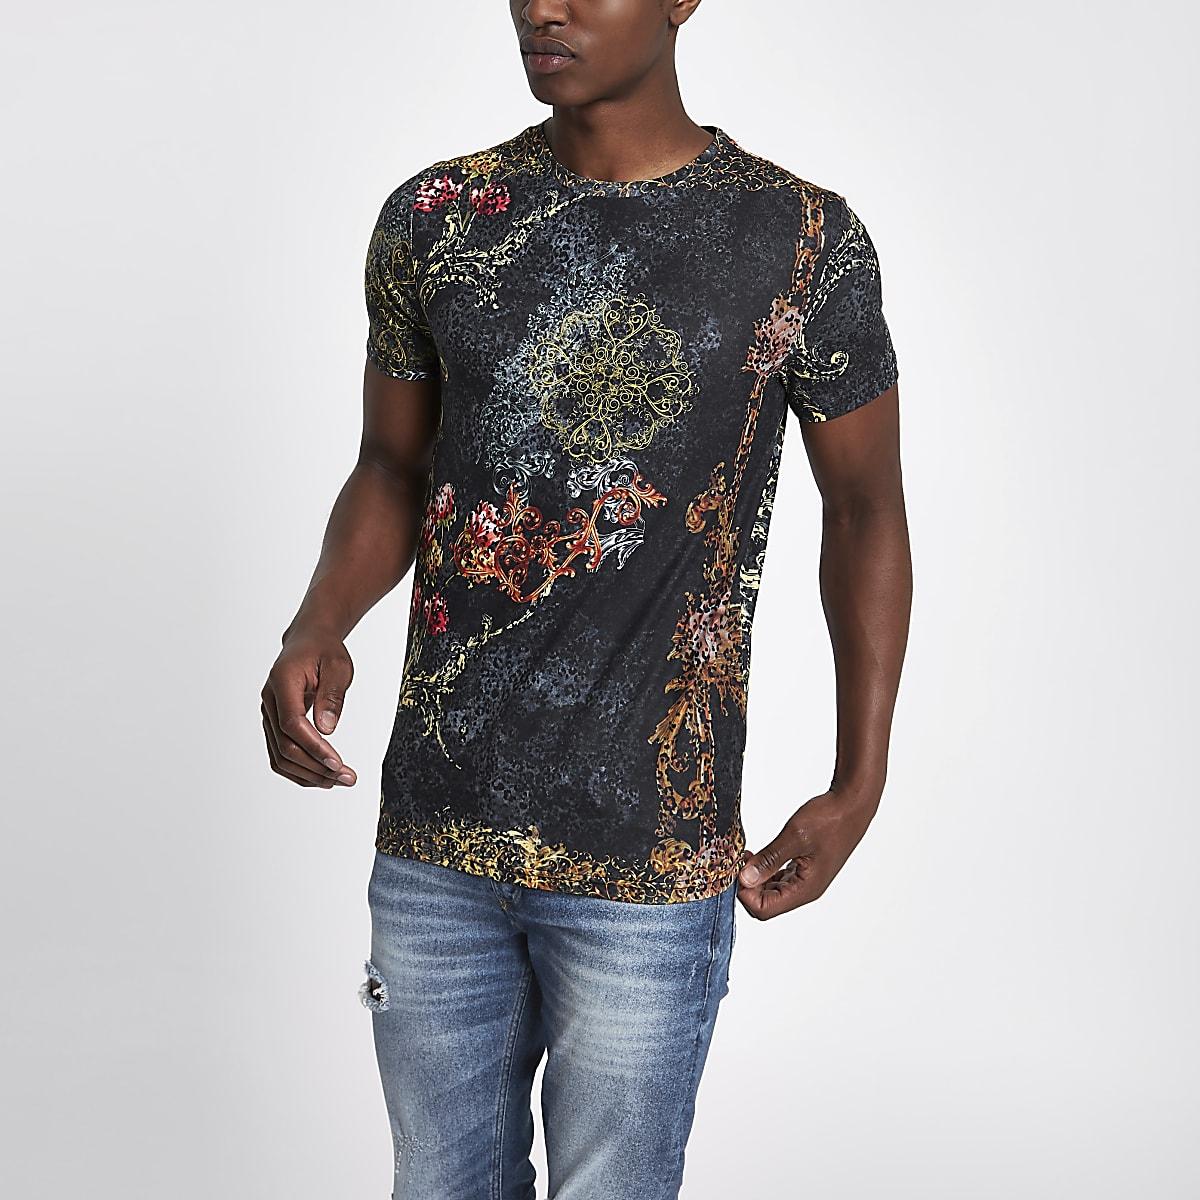 Schwarzes Slim Fit T-Shirt mit Leopardenprint